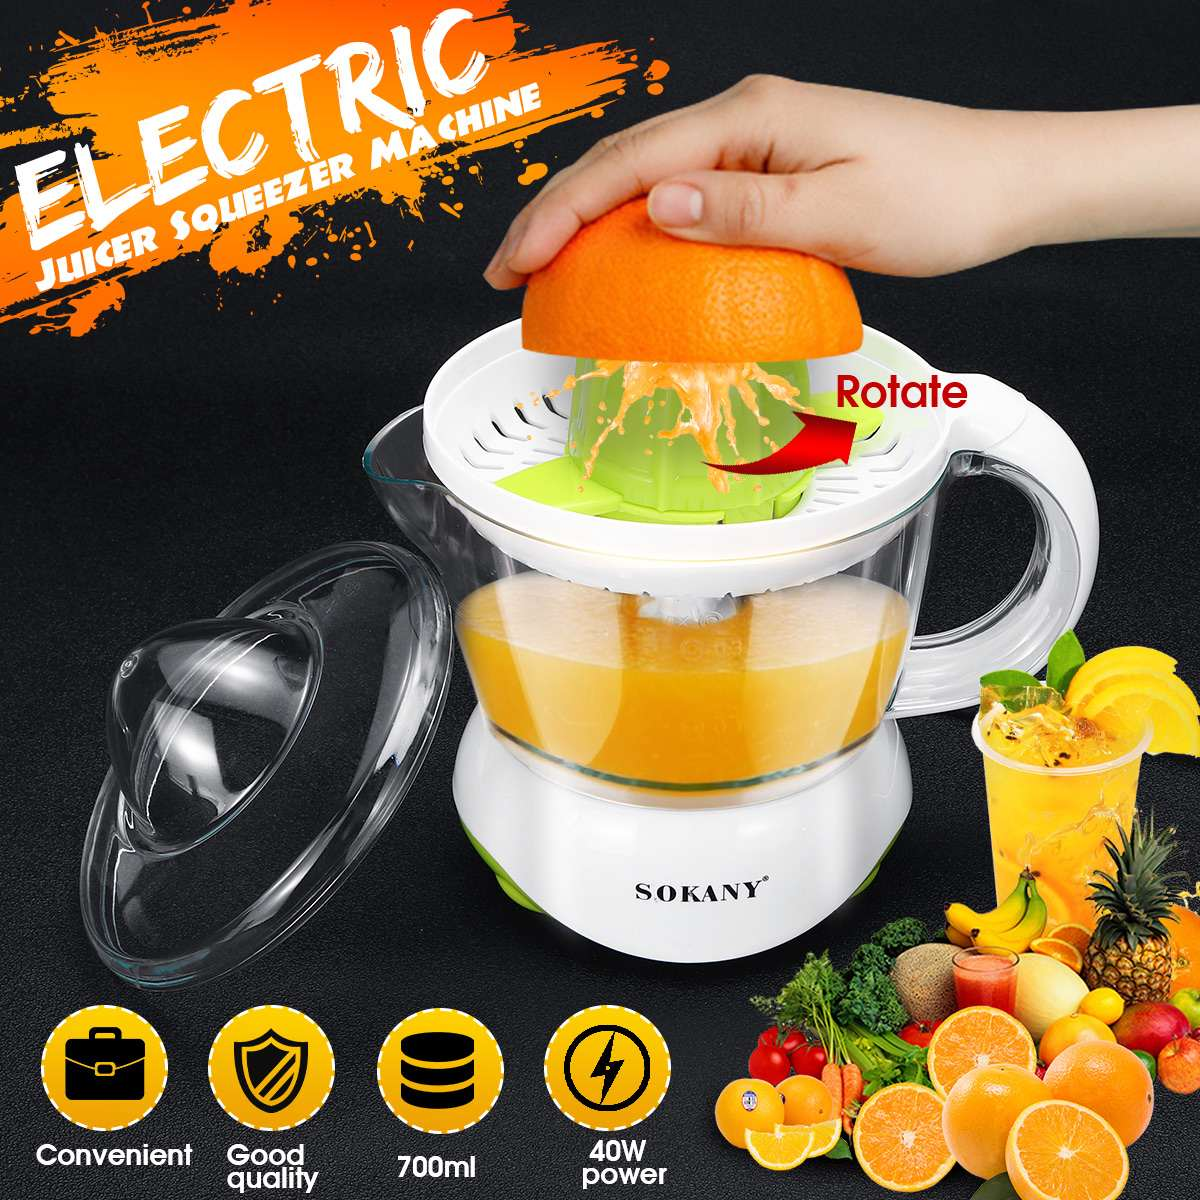 220-240V Electric Juicer Squeezer Machine Orange Lemon Citrus Fruit Press-Juice Extractor ABS 700ml Transparent Scale Marking